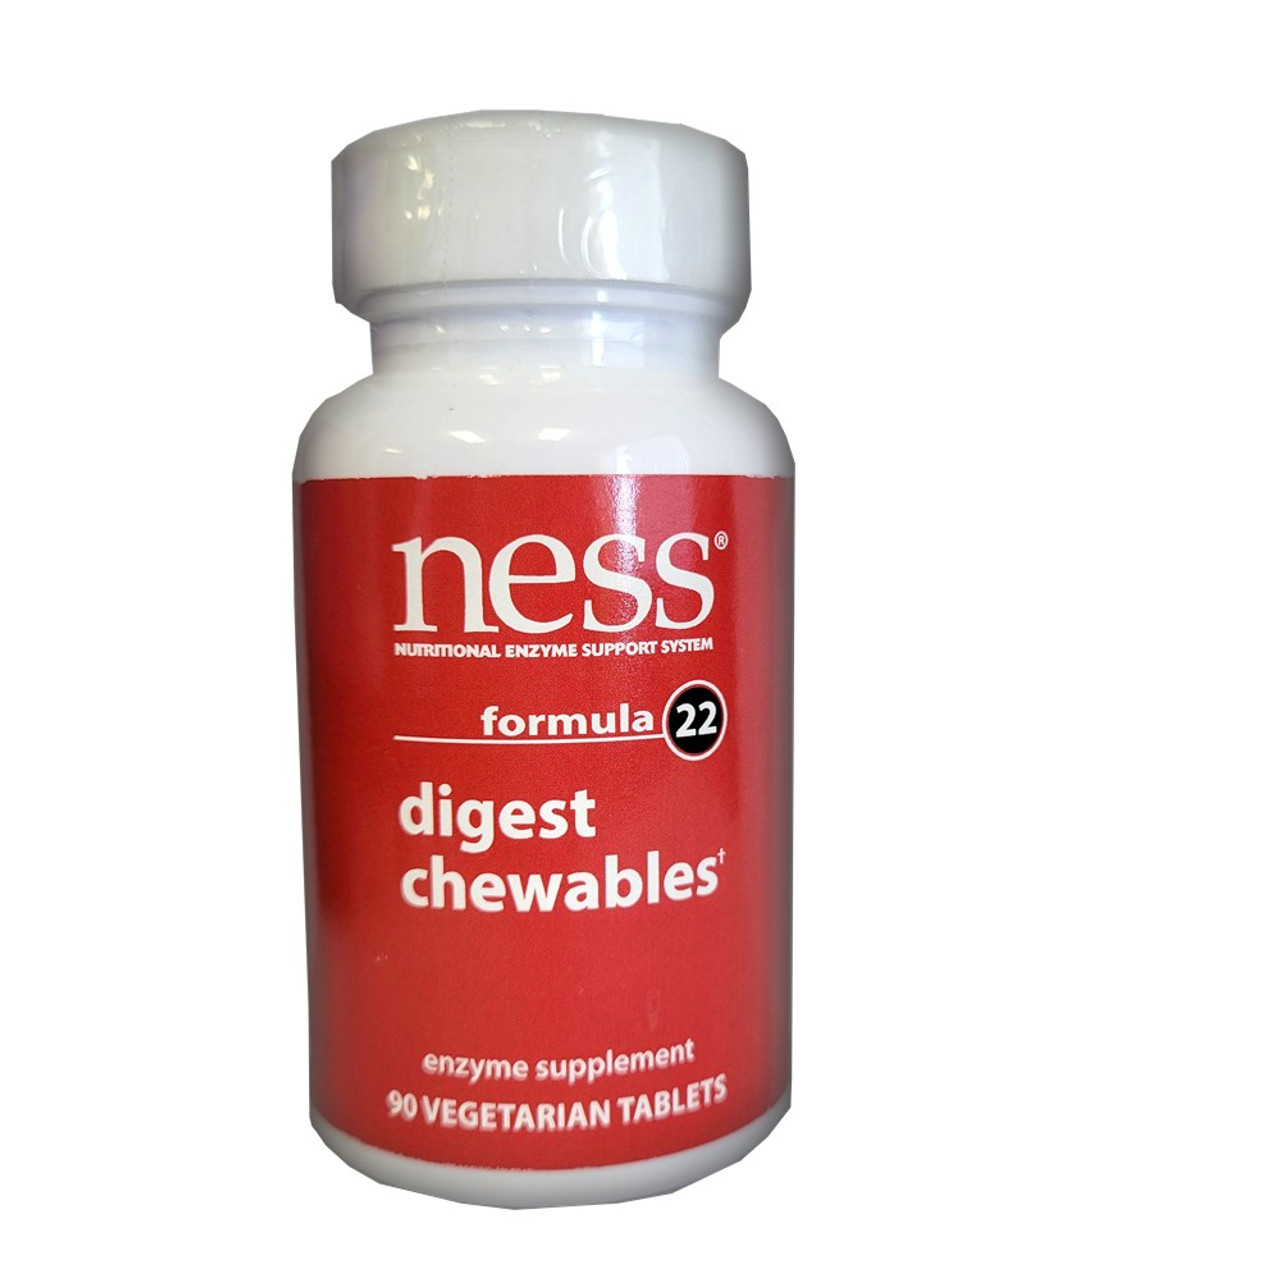 Ness Digest Chewables